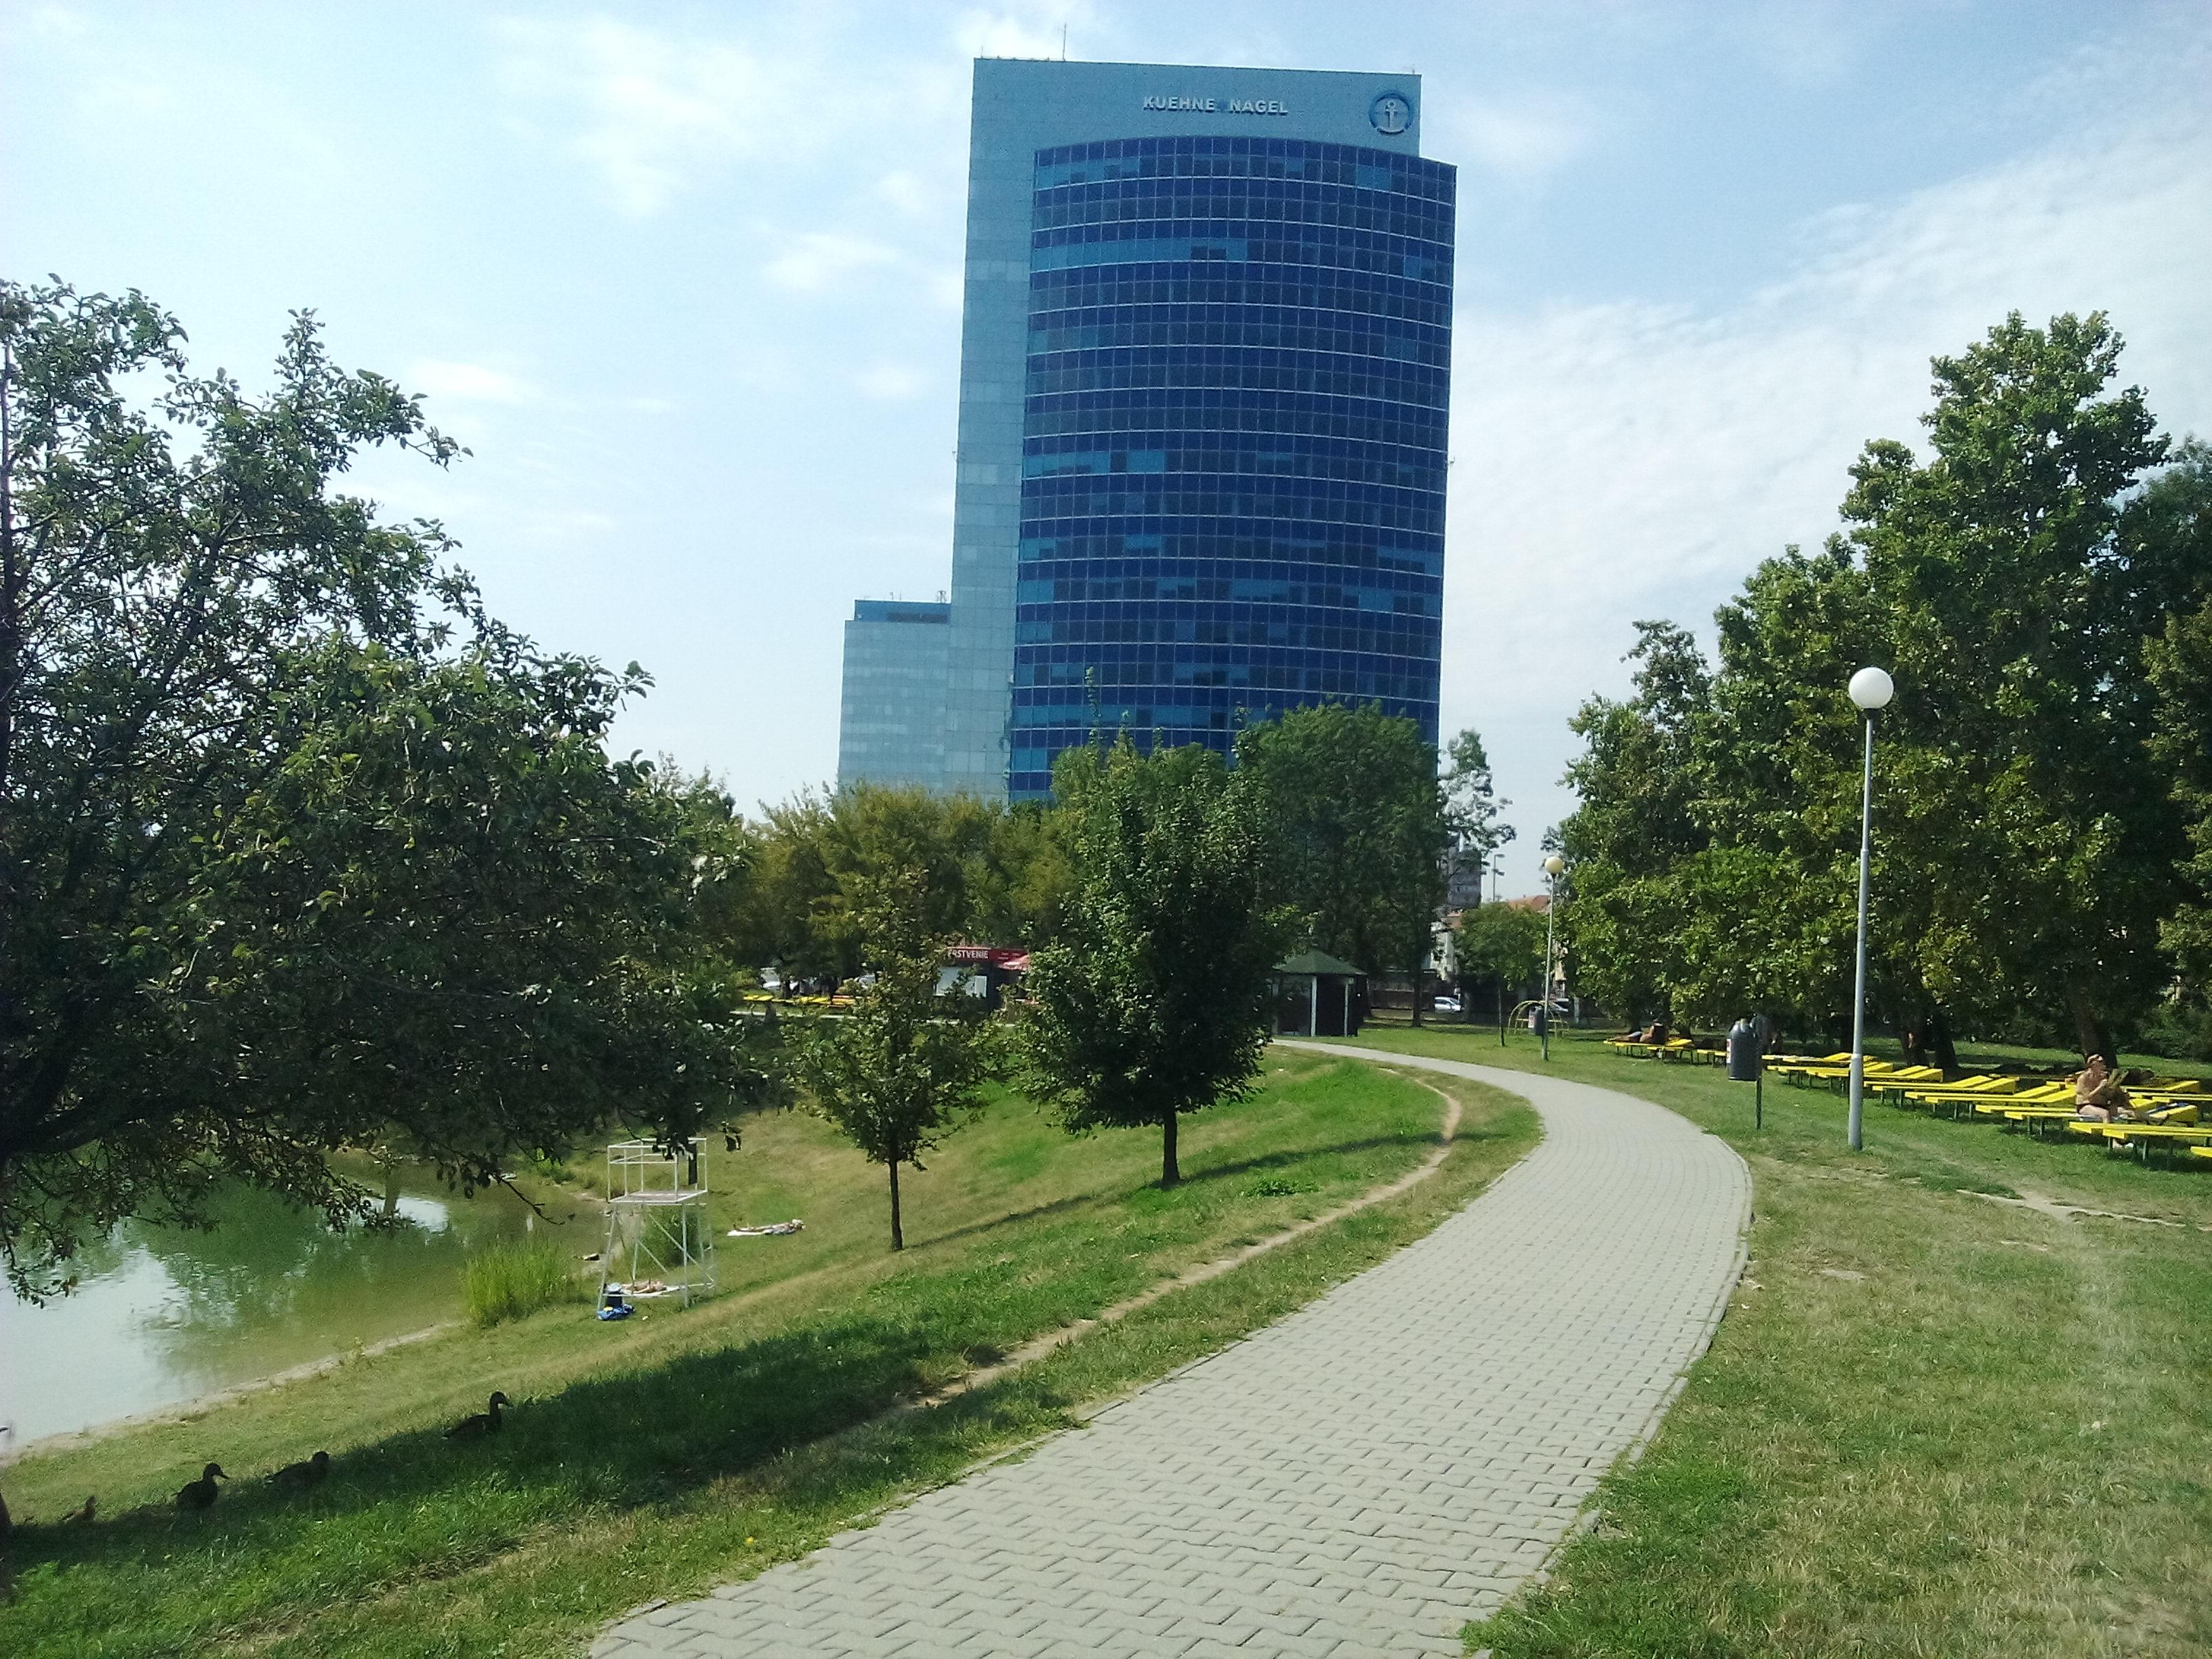 Kuchajda